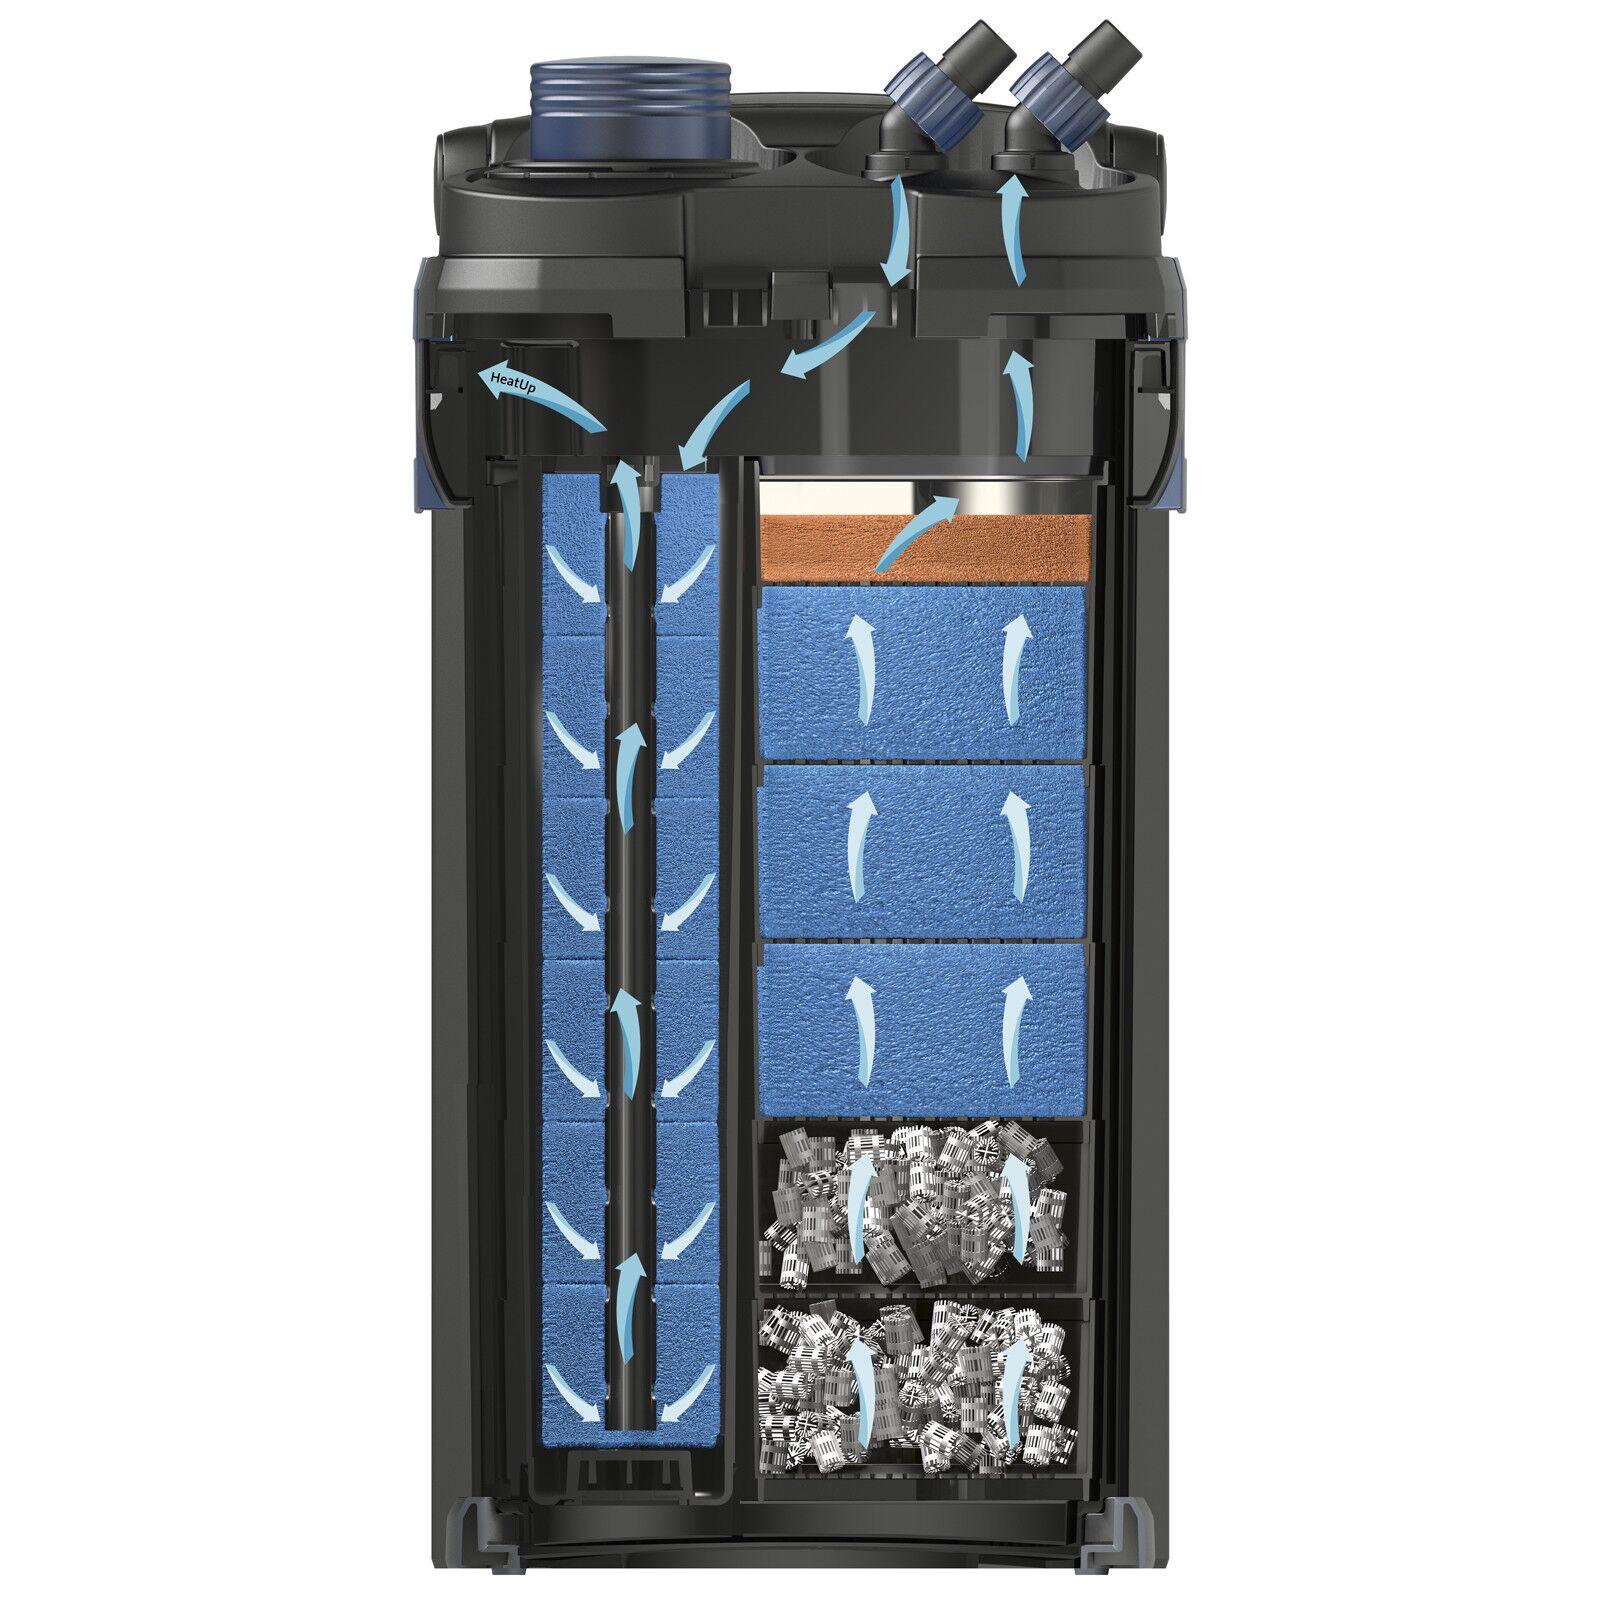 Oase - BioMaster - Thermo - 350 | Aquasabi - Aquascaping Shop